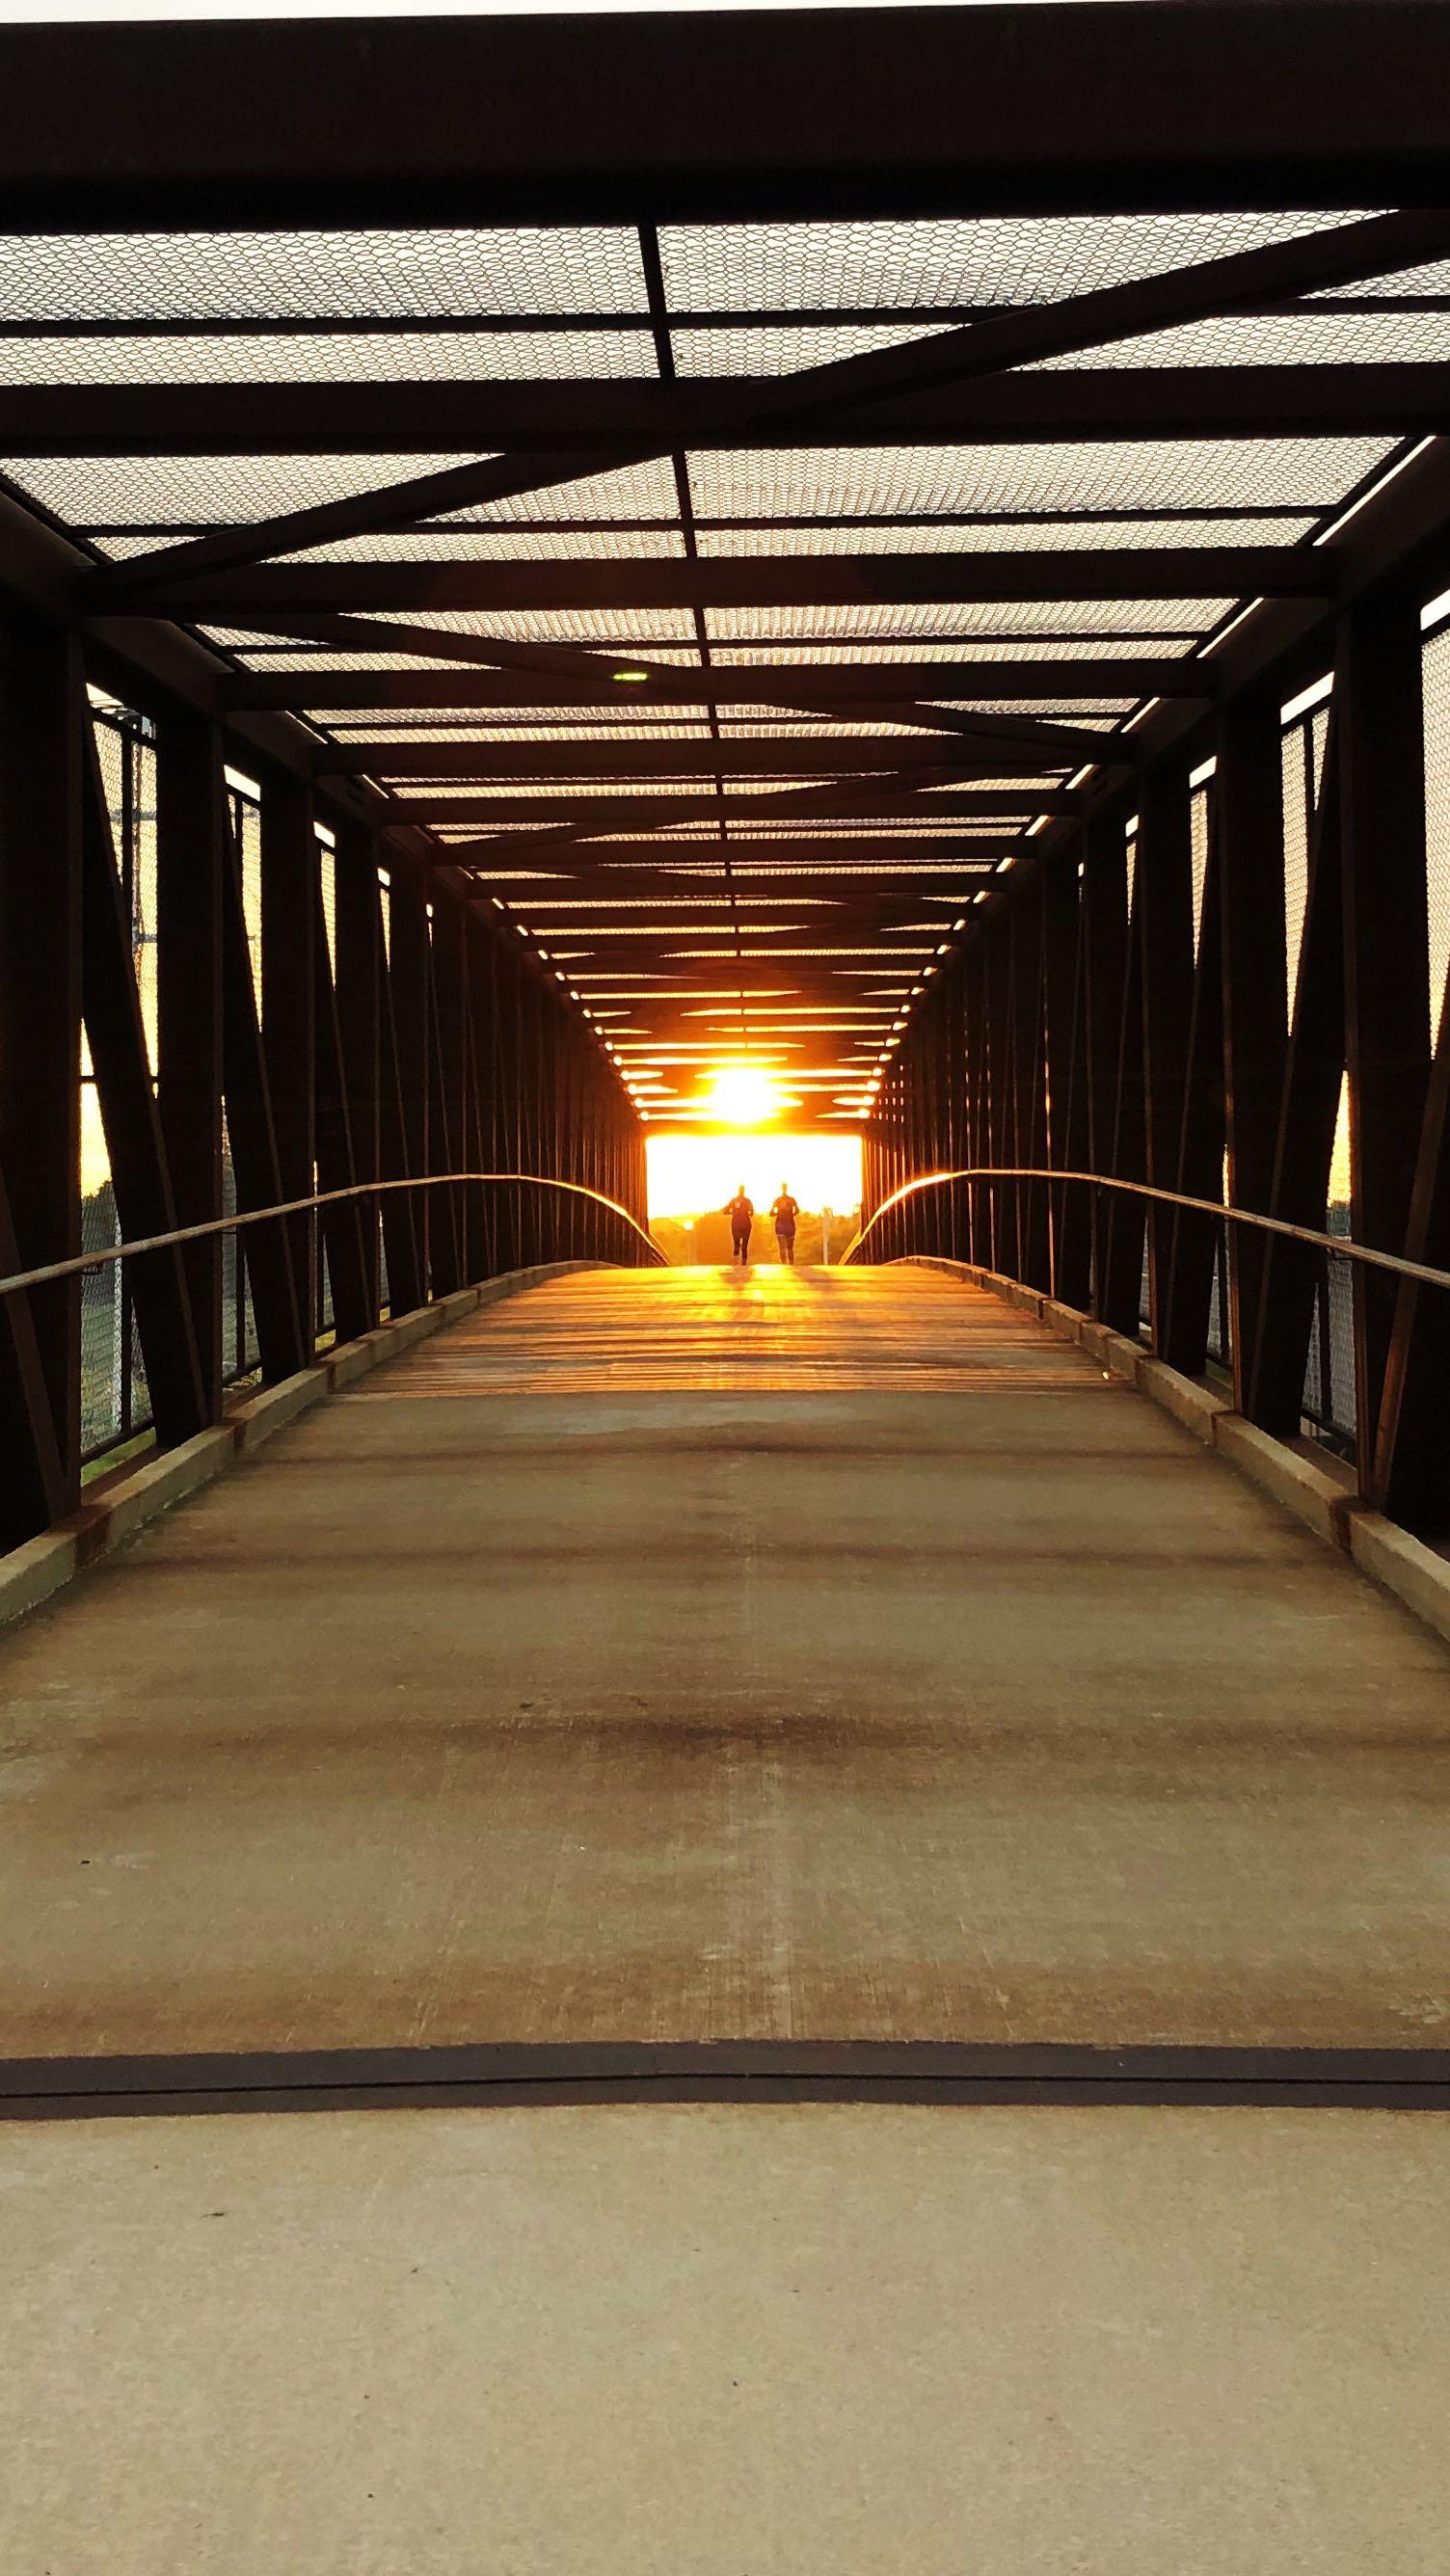 Karthika Gupta Photography - Memorable Jaunts DPS Article Creative Photography Photographing iPhone at sunset